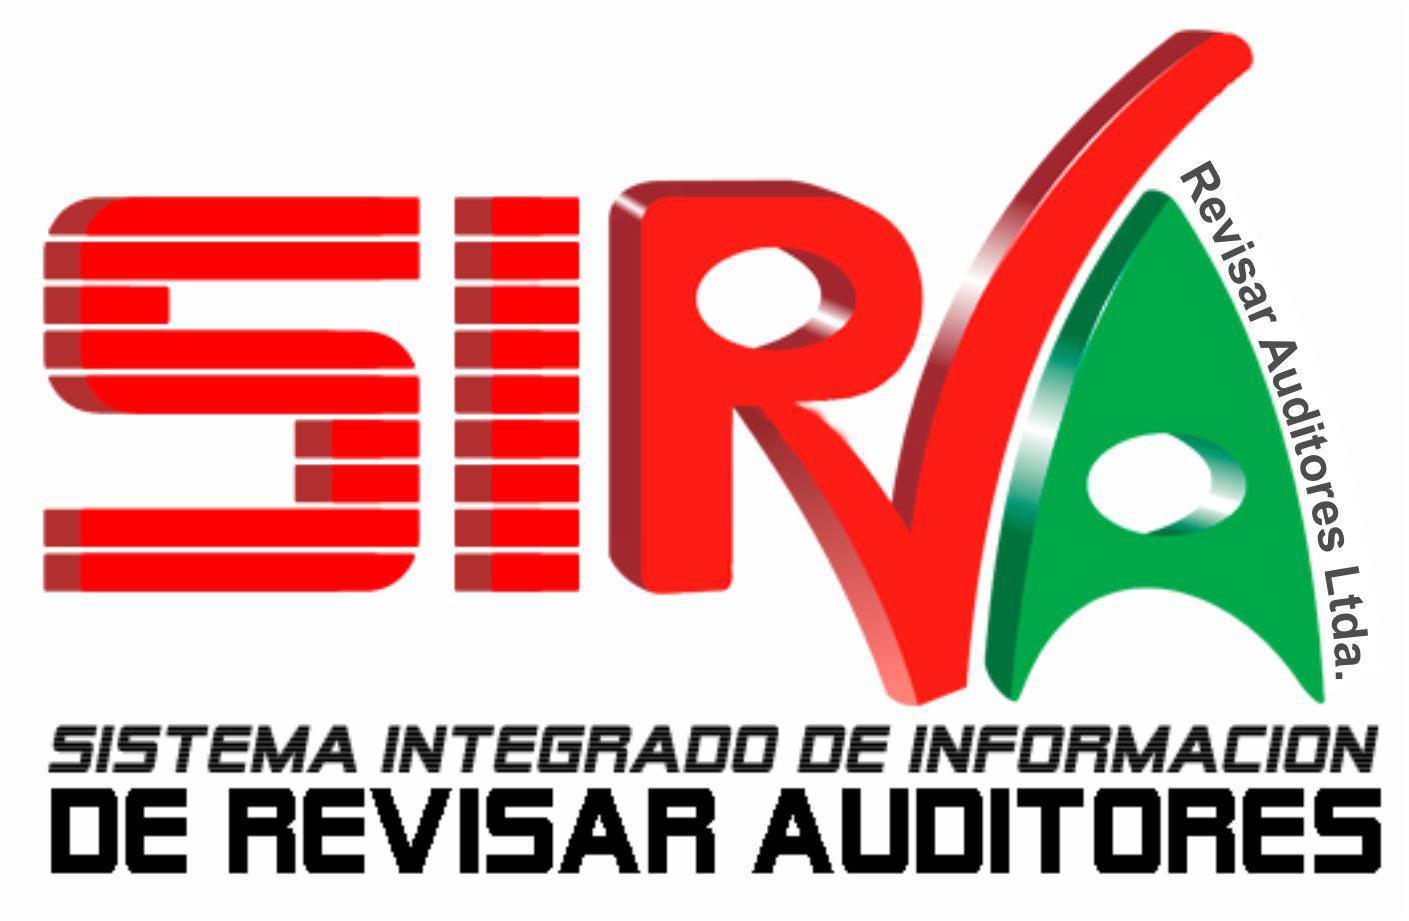 Sistea integrado de información de revisar auditores